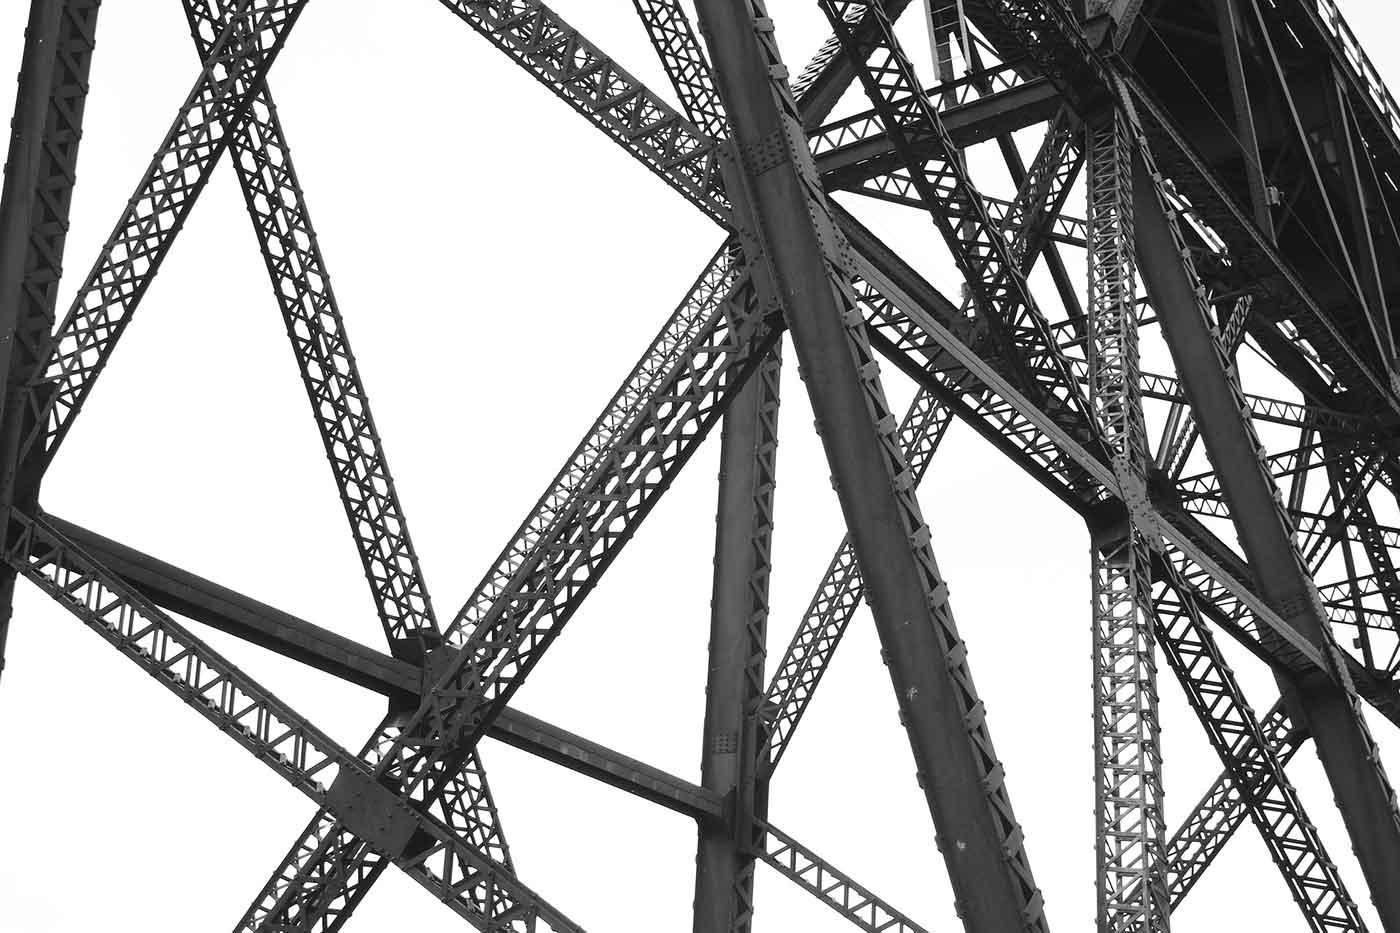 Railroad bridge beams